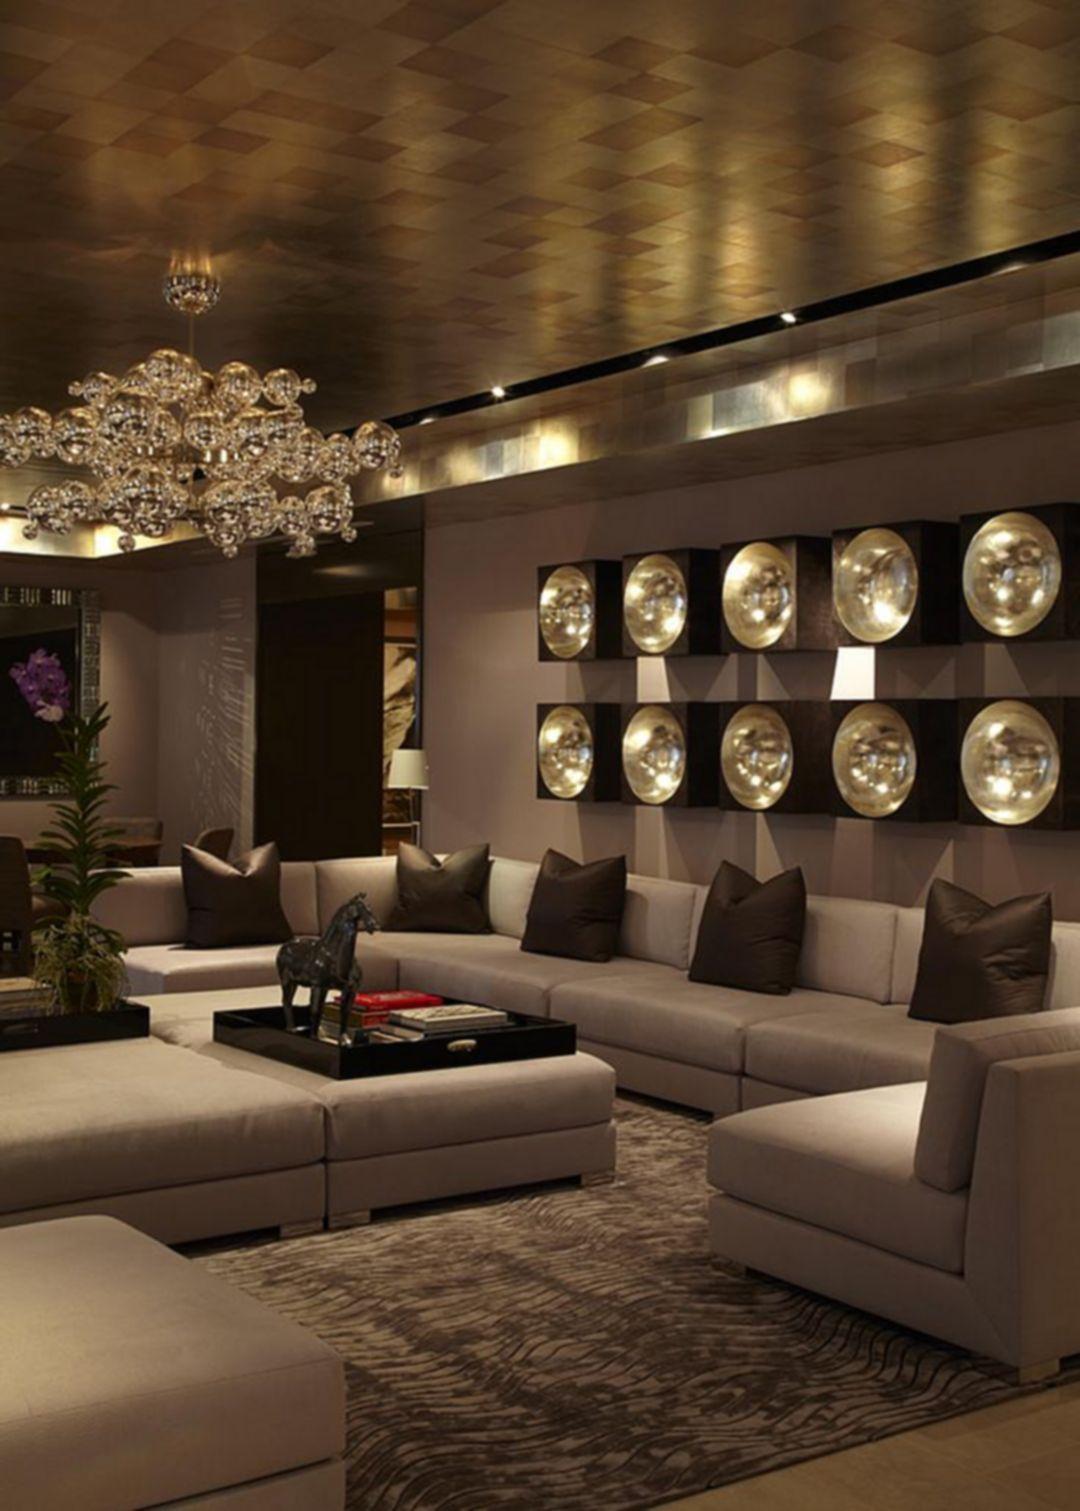 Nice 20 Luxury Living Room Design Ideas That Your Guests Will Be Admire Bosidolot Com Roskoshnye Gostinye Interer I Dizajn Interera